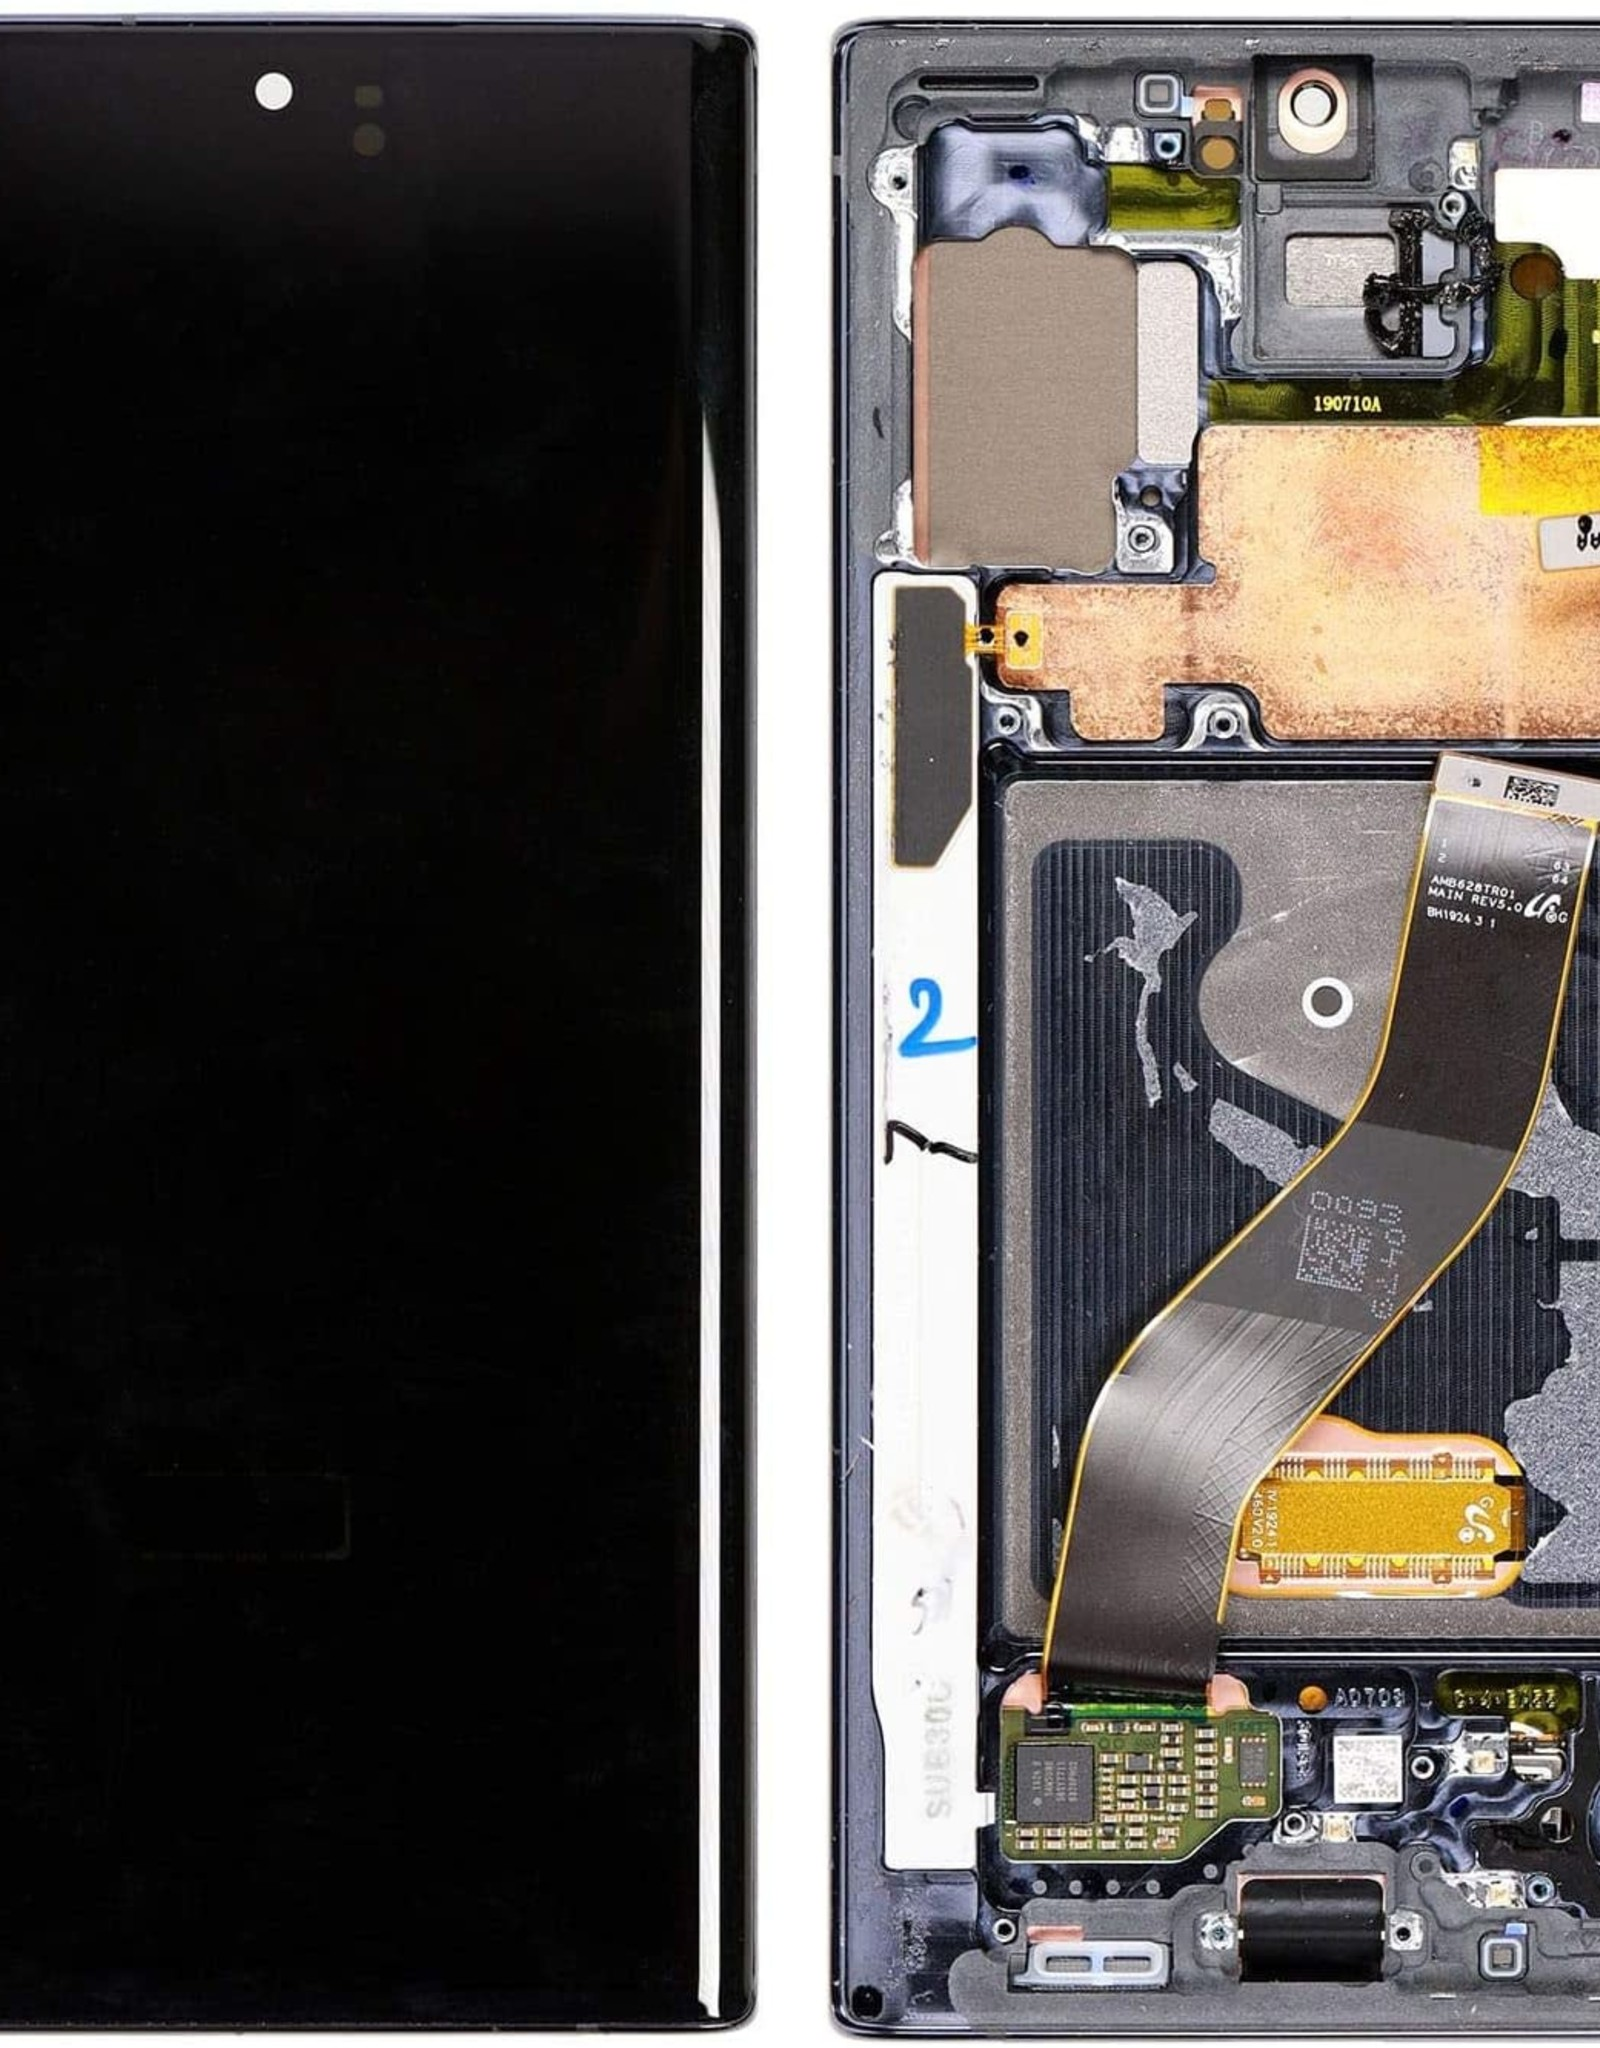 Samsung Galaxy Note10 Display N970F N970 N9700 LCD Touch Screen Digitizer w/ Frame Assembly